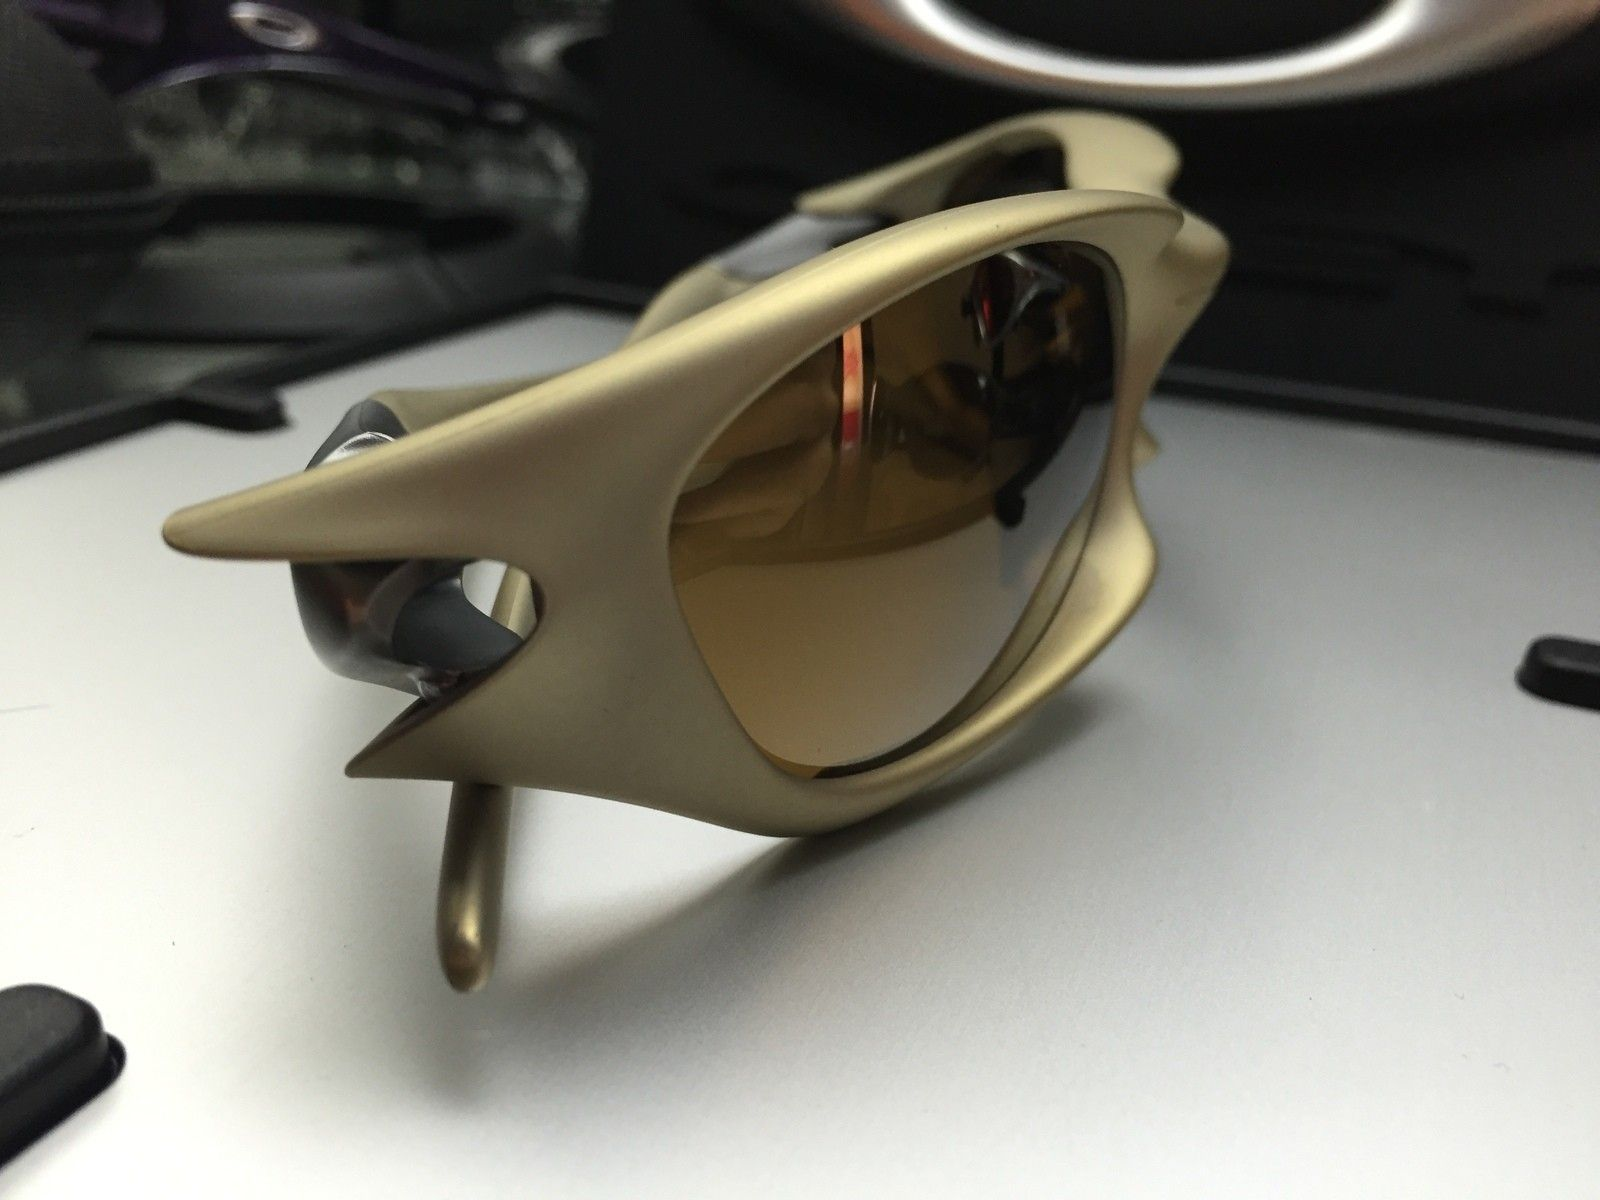 BNIB Valve Platinium w/ Gold Iridium sku#03-876 - image.jpeg